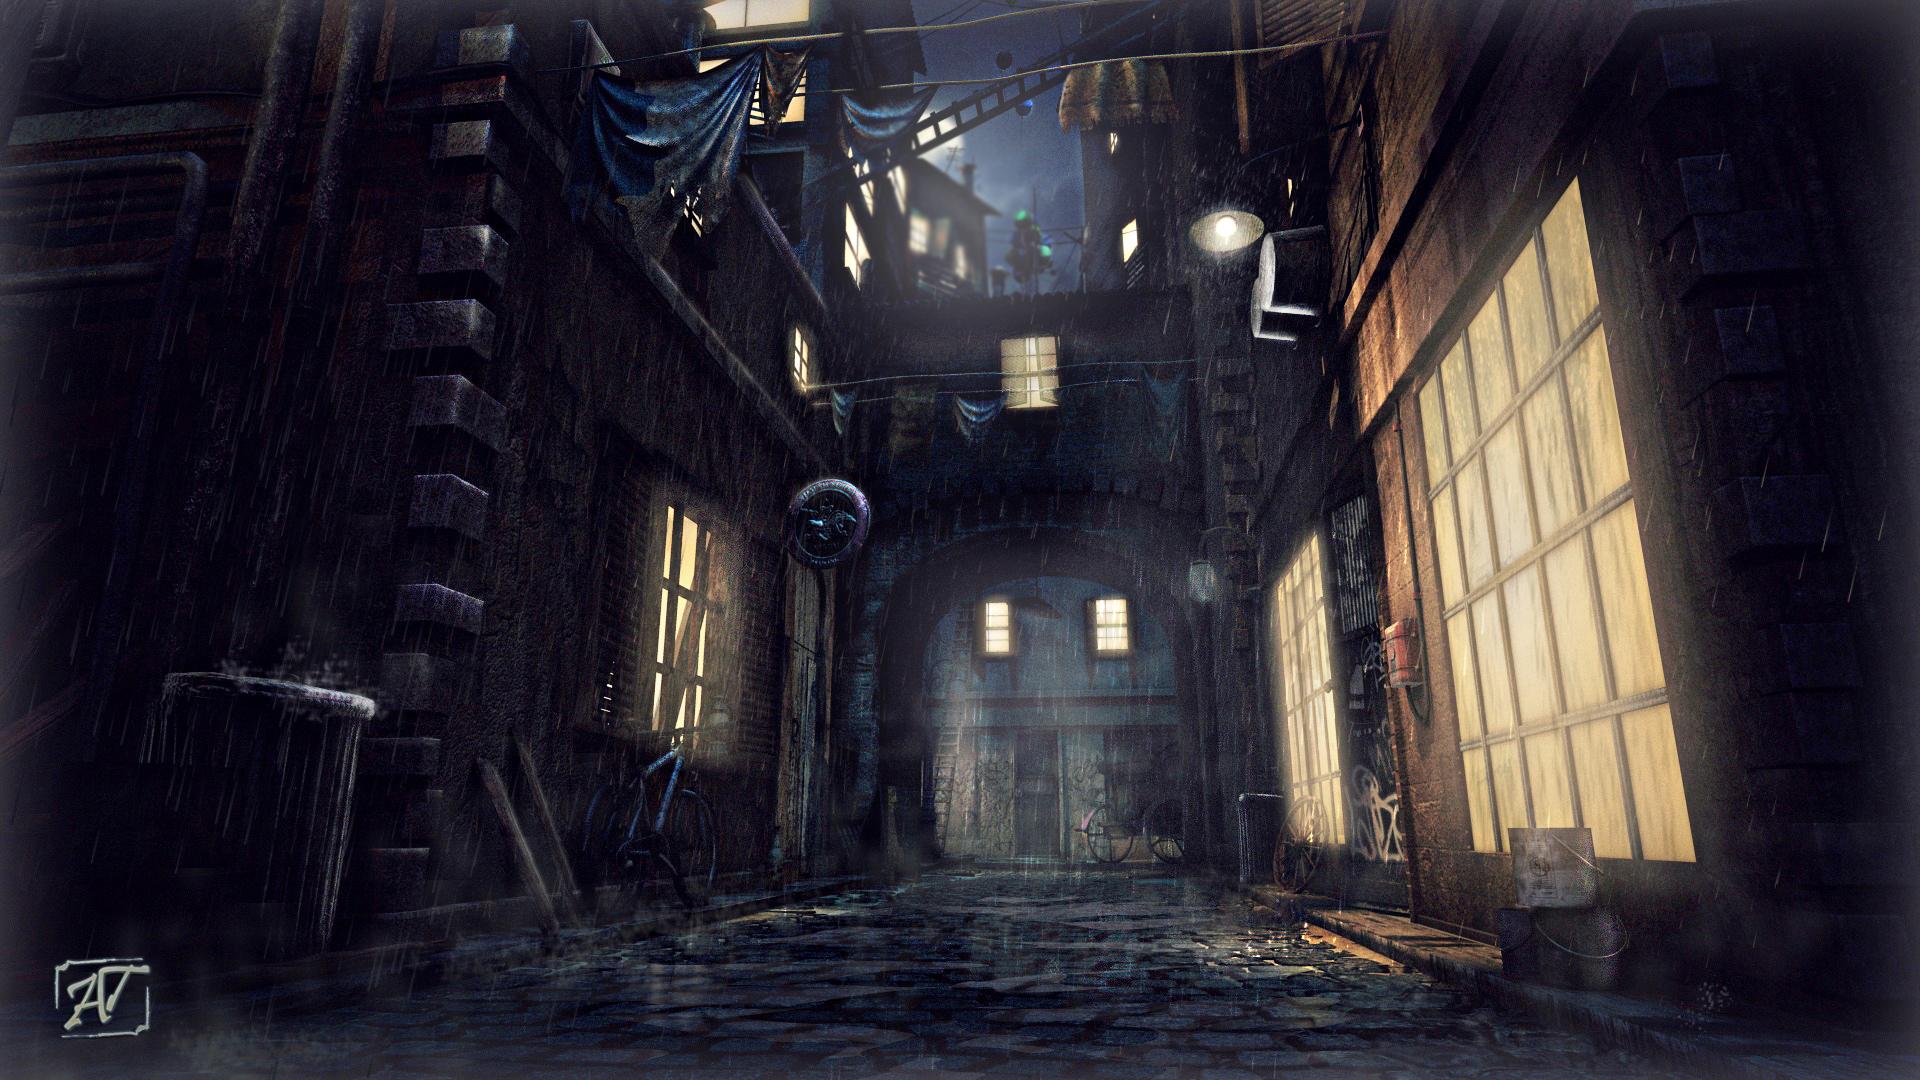 AlleyWay NightShot Rainy by AhmadTurk